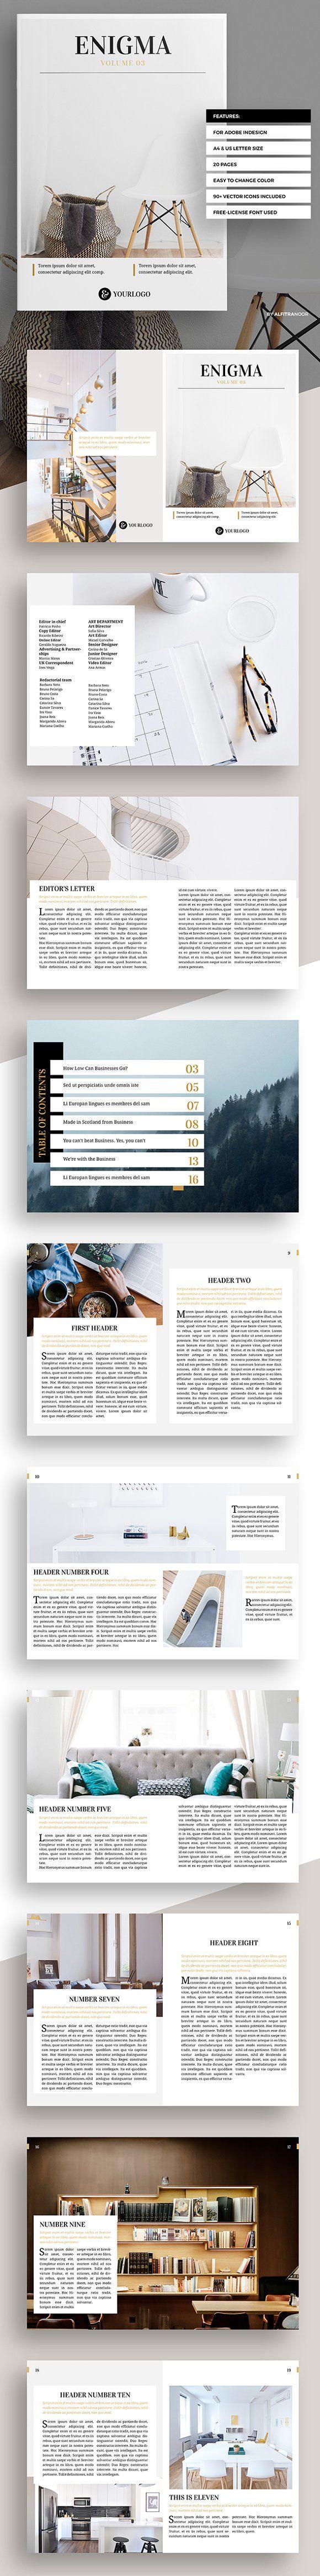 Enigma Brochure @creativework247